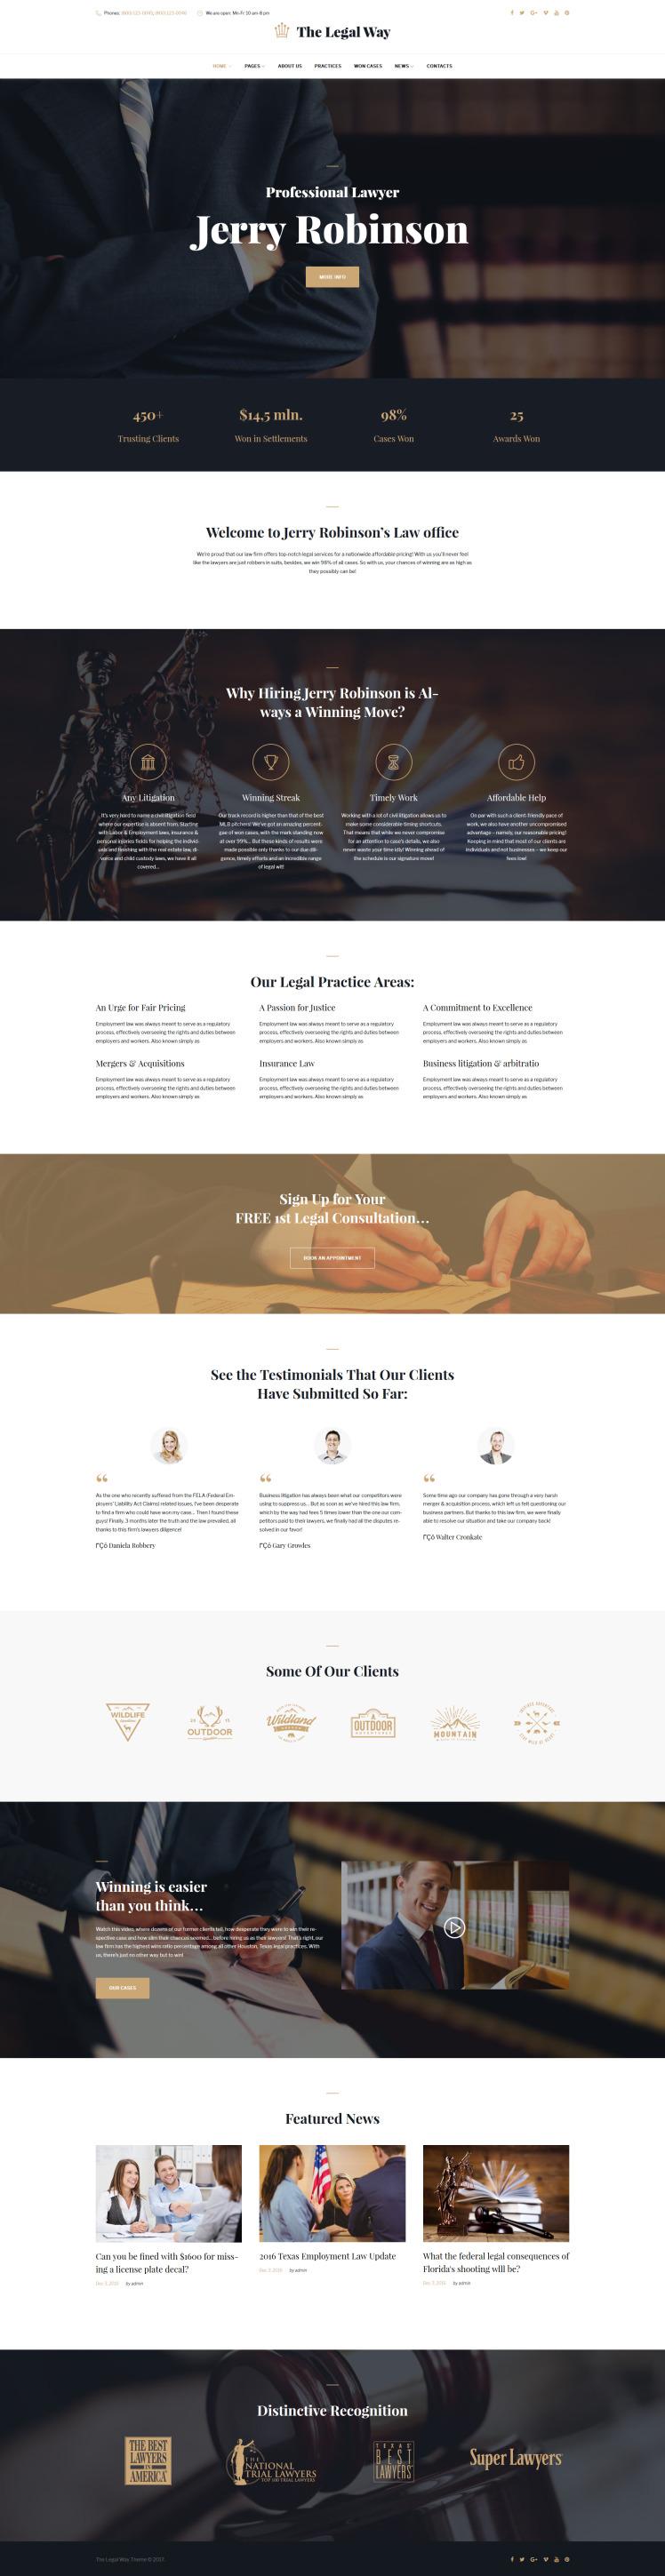 The Legal Way Lawyer Attorney WordPress Theme